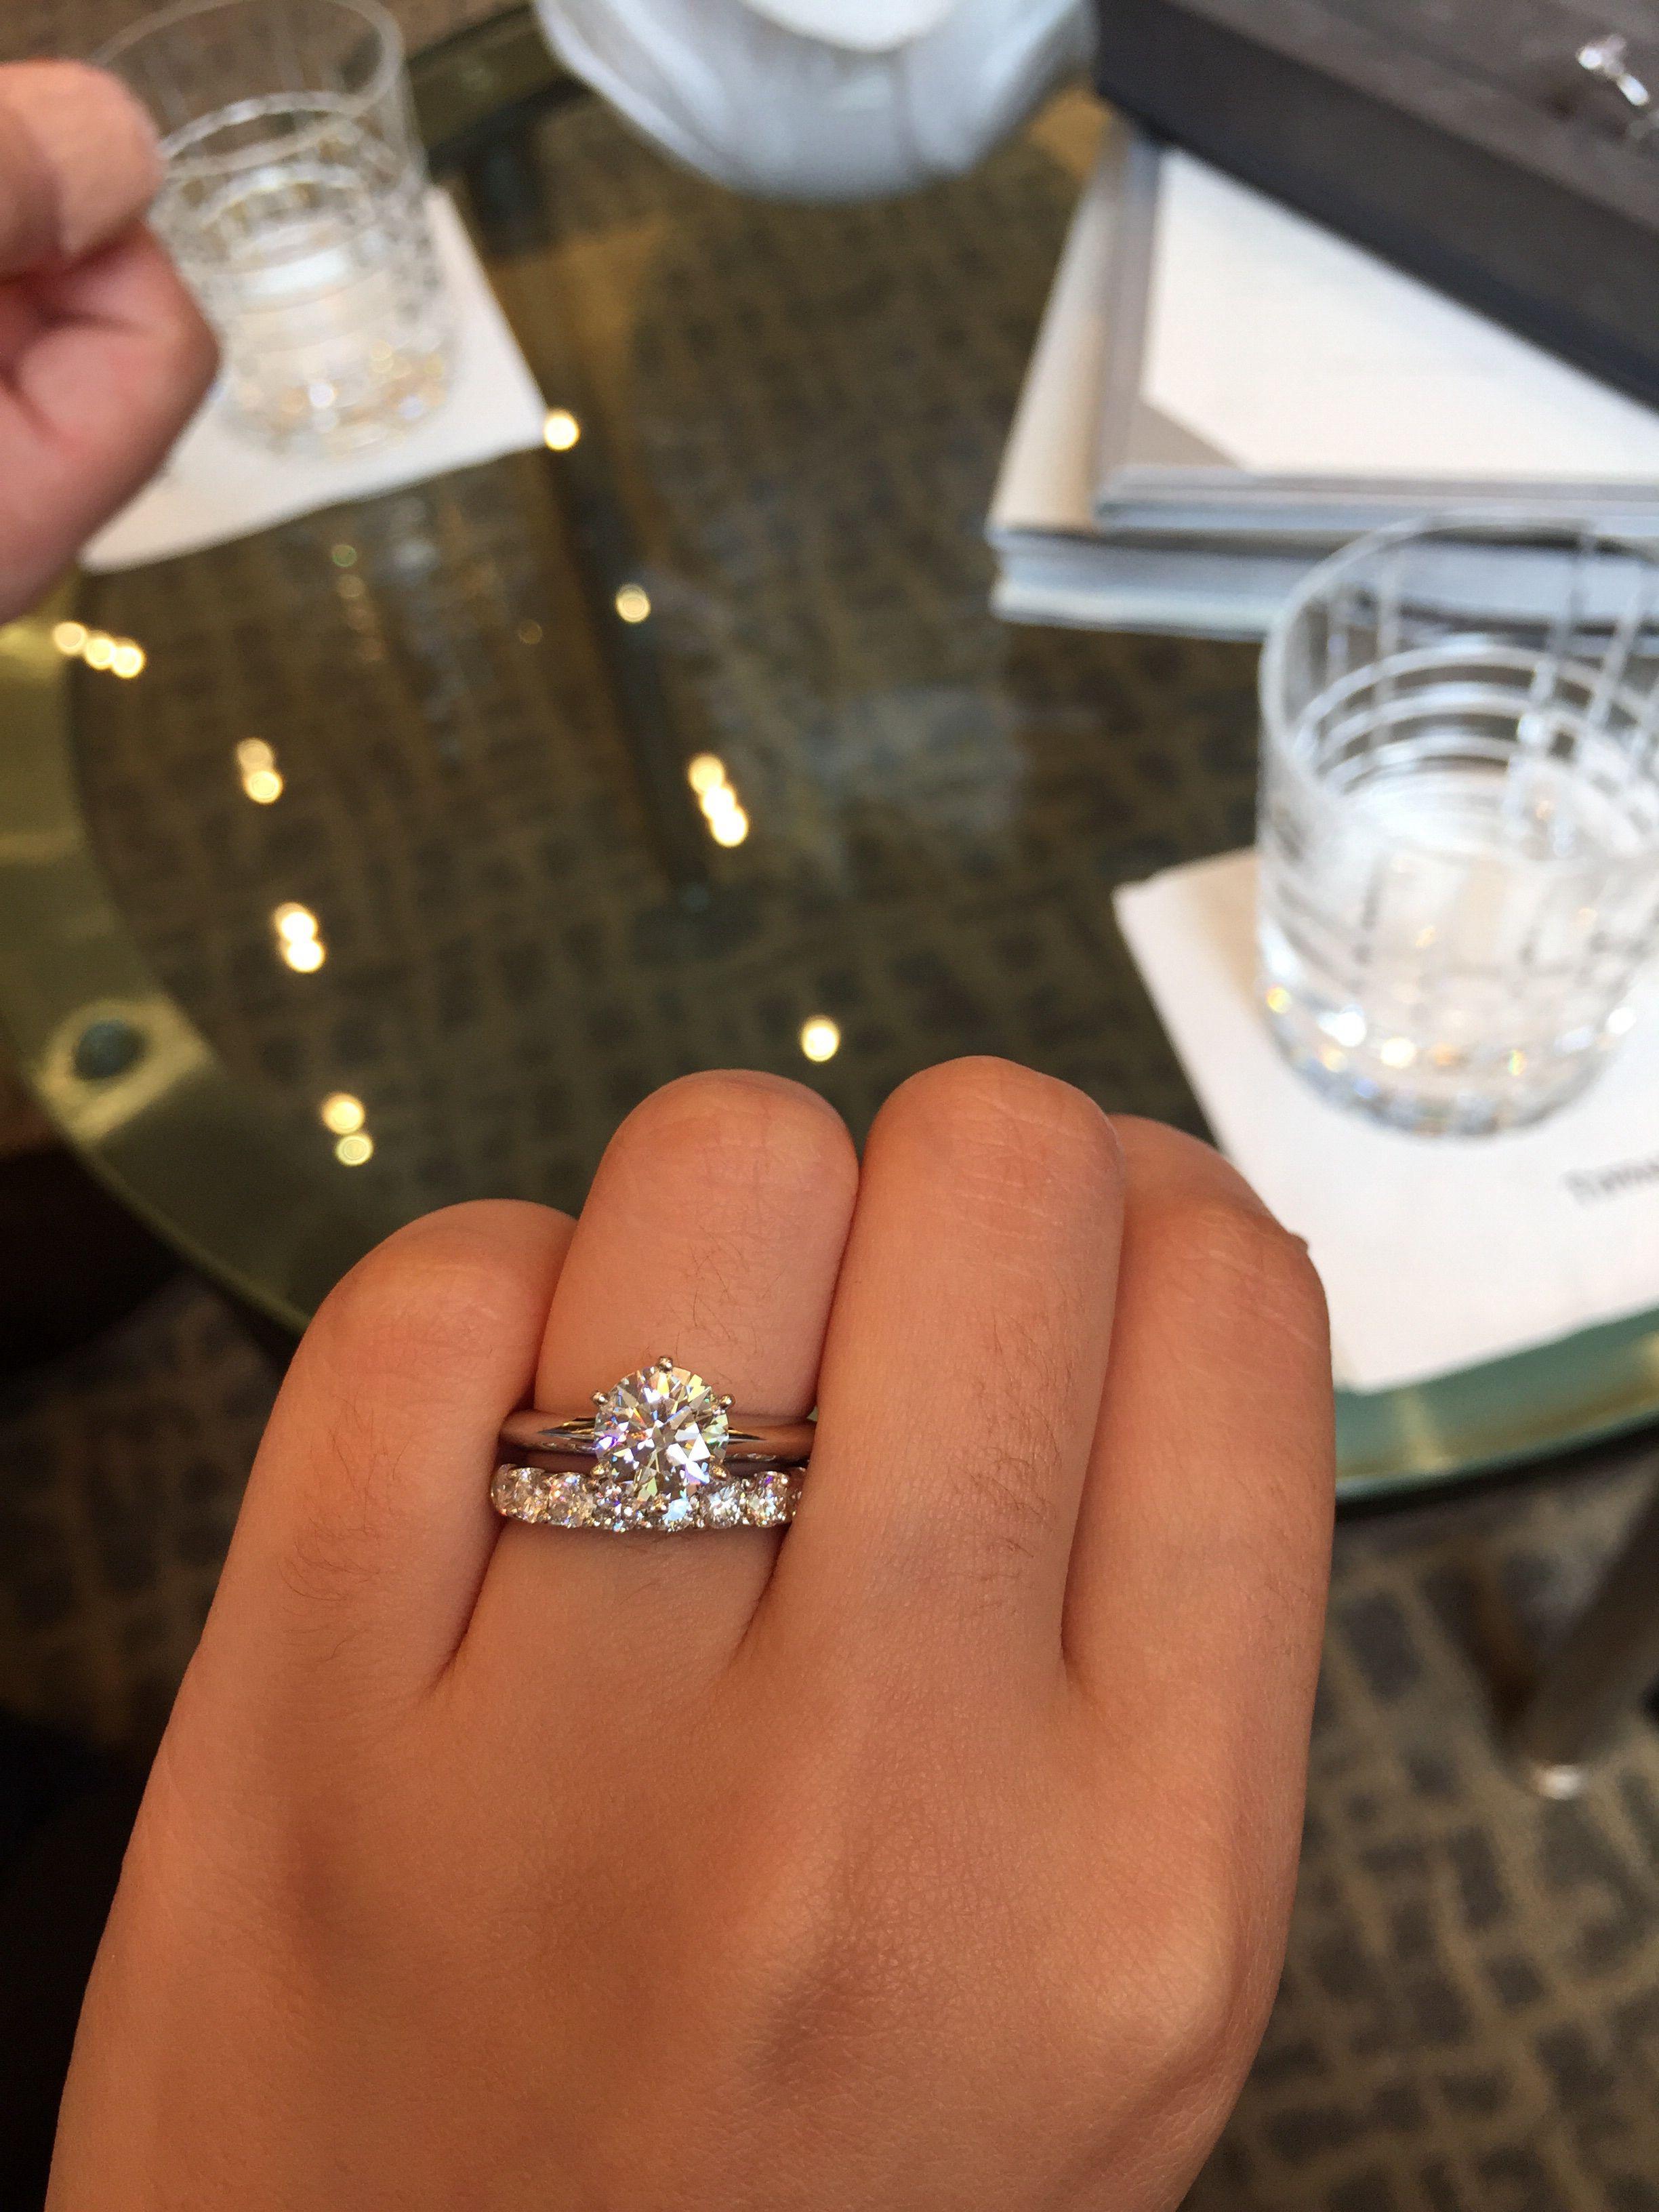 Dainty Ering With Chunky Wedding Band Diamon Wedding Band Half Eternity Wedding Band Dainty Engagement Rings